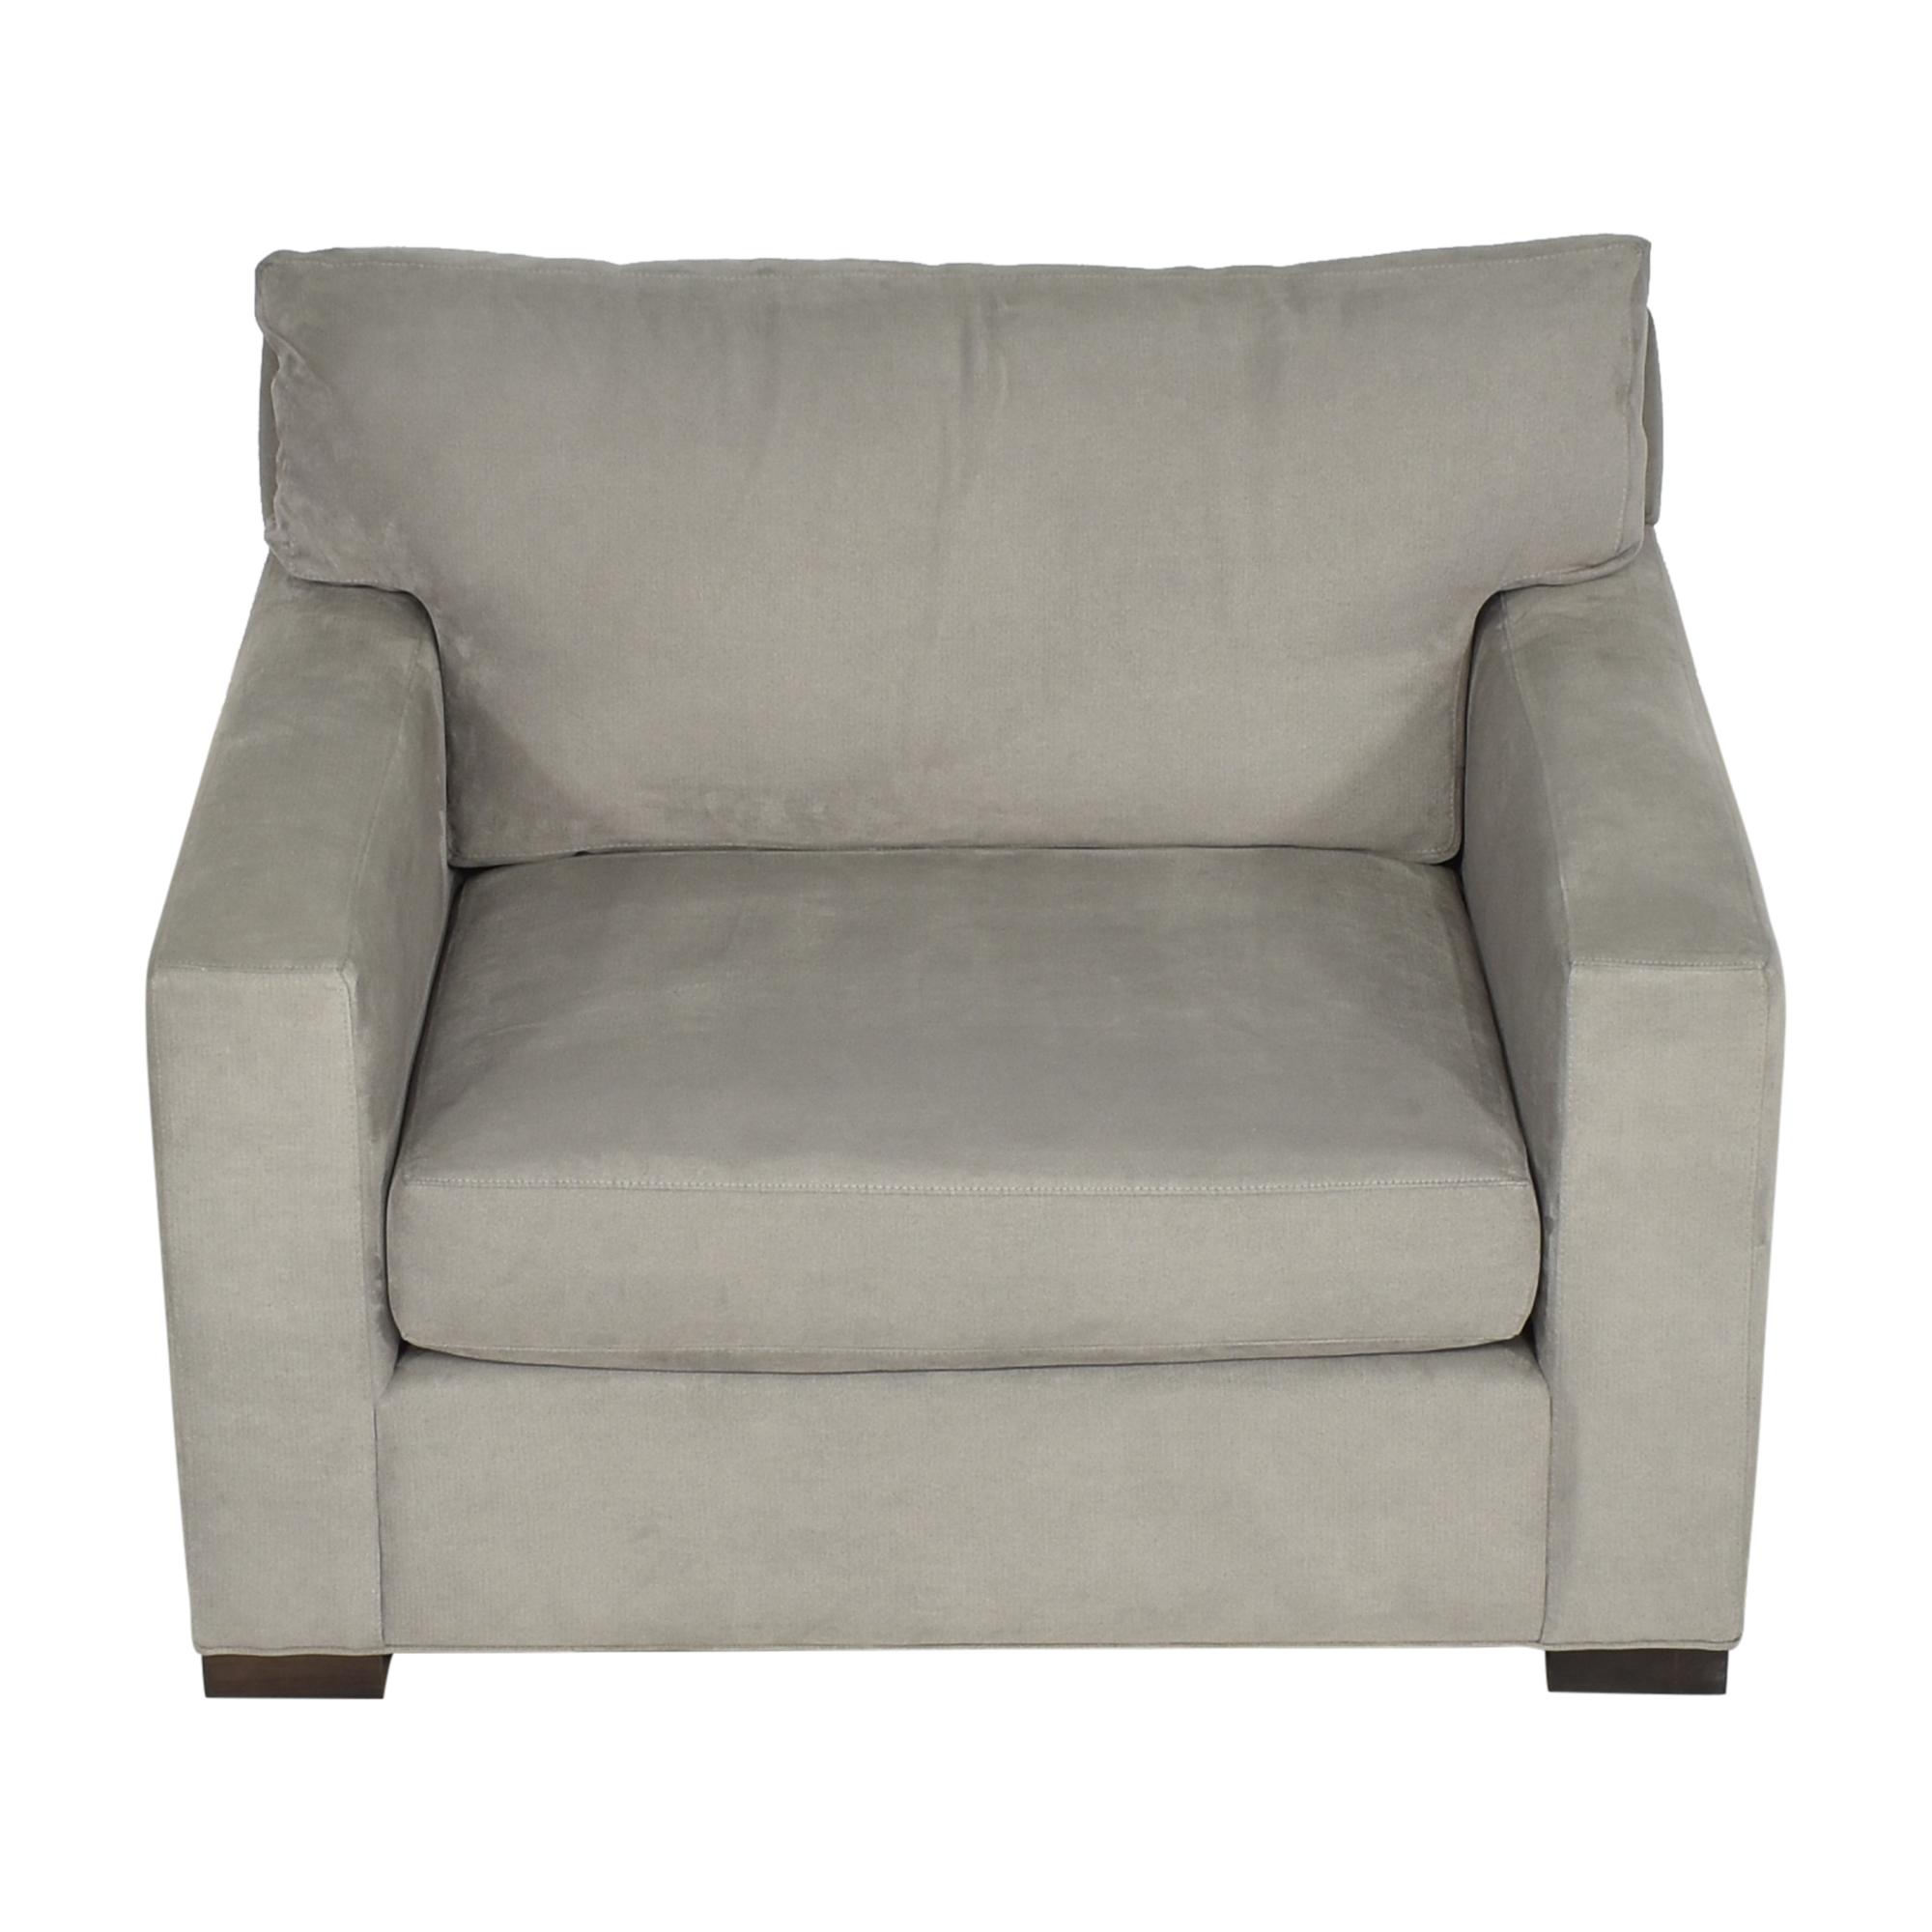 Crate & Barrel Crate & Barrel Axis Chair nyc